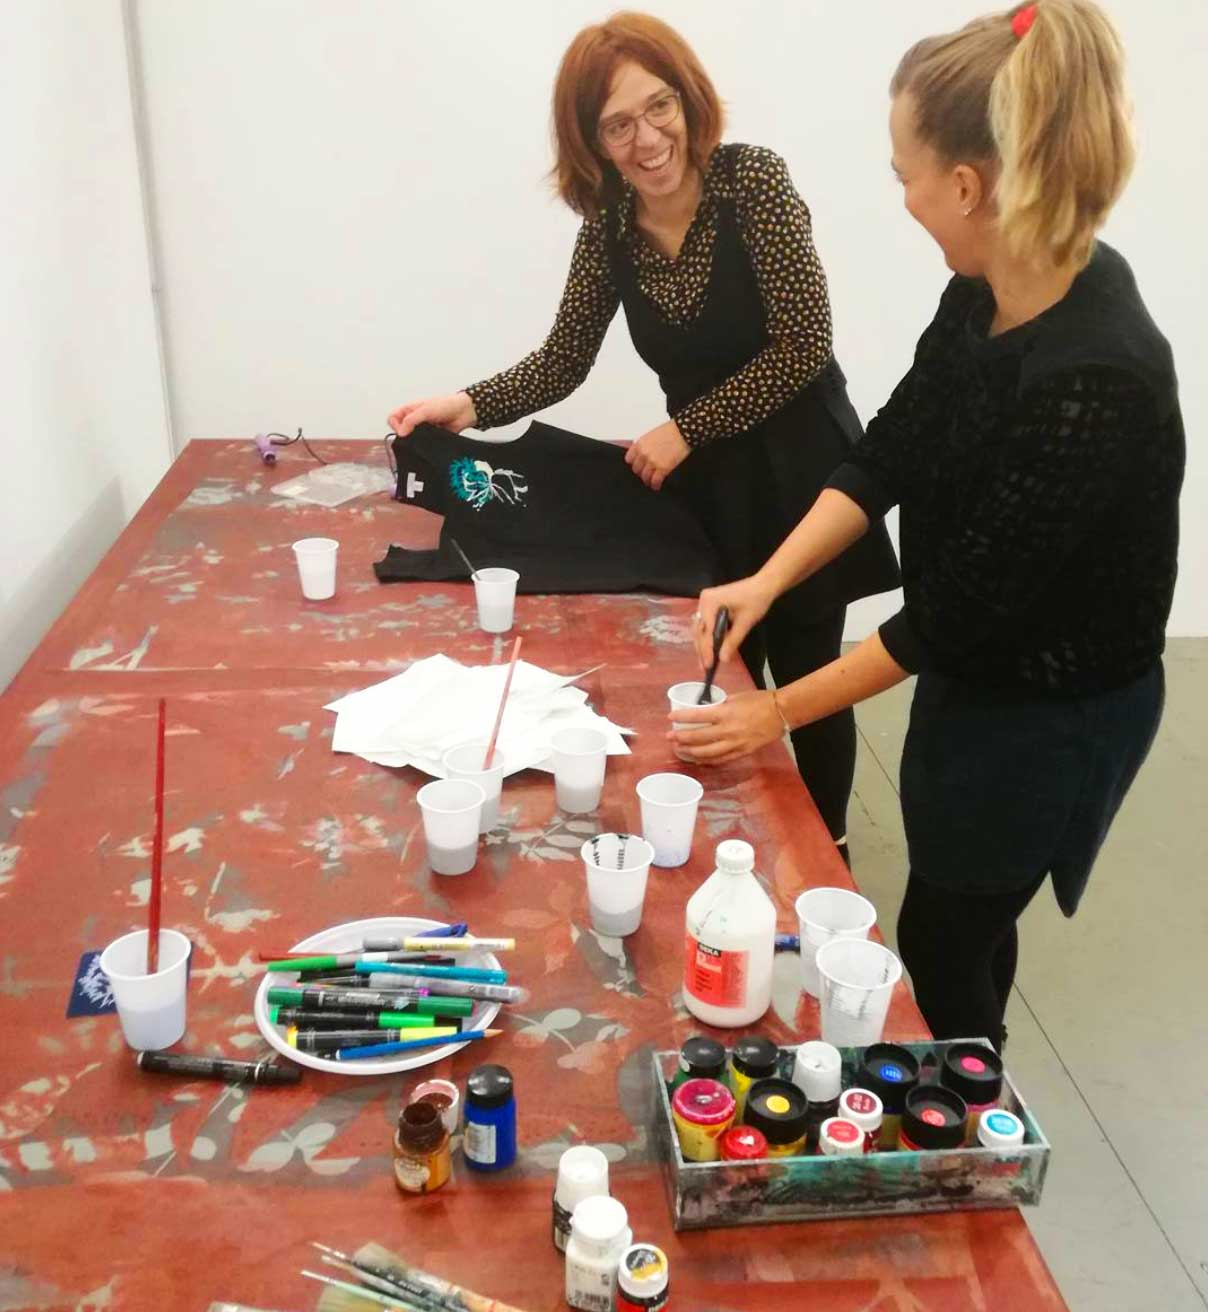 nuala goodman workshop pittura textile design